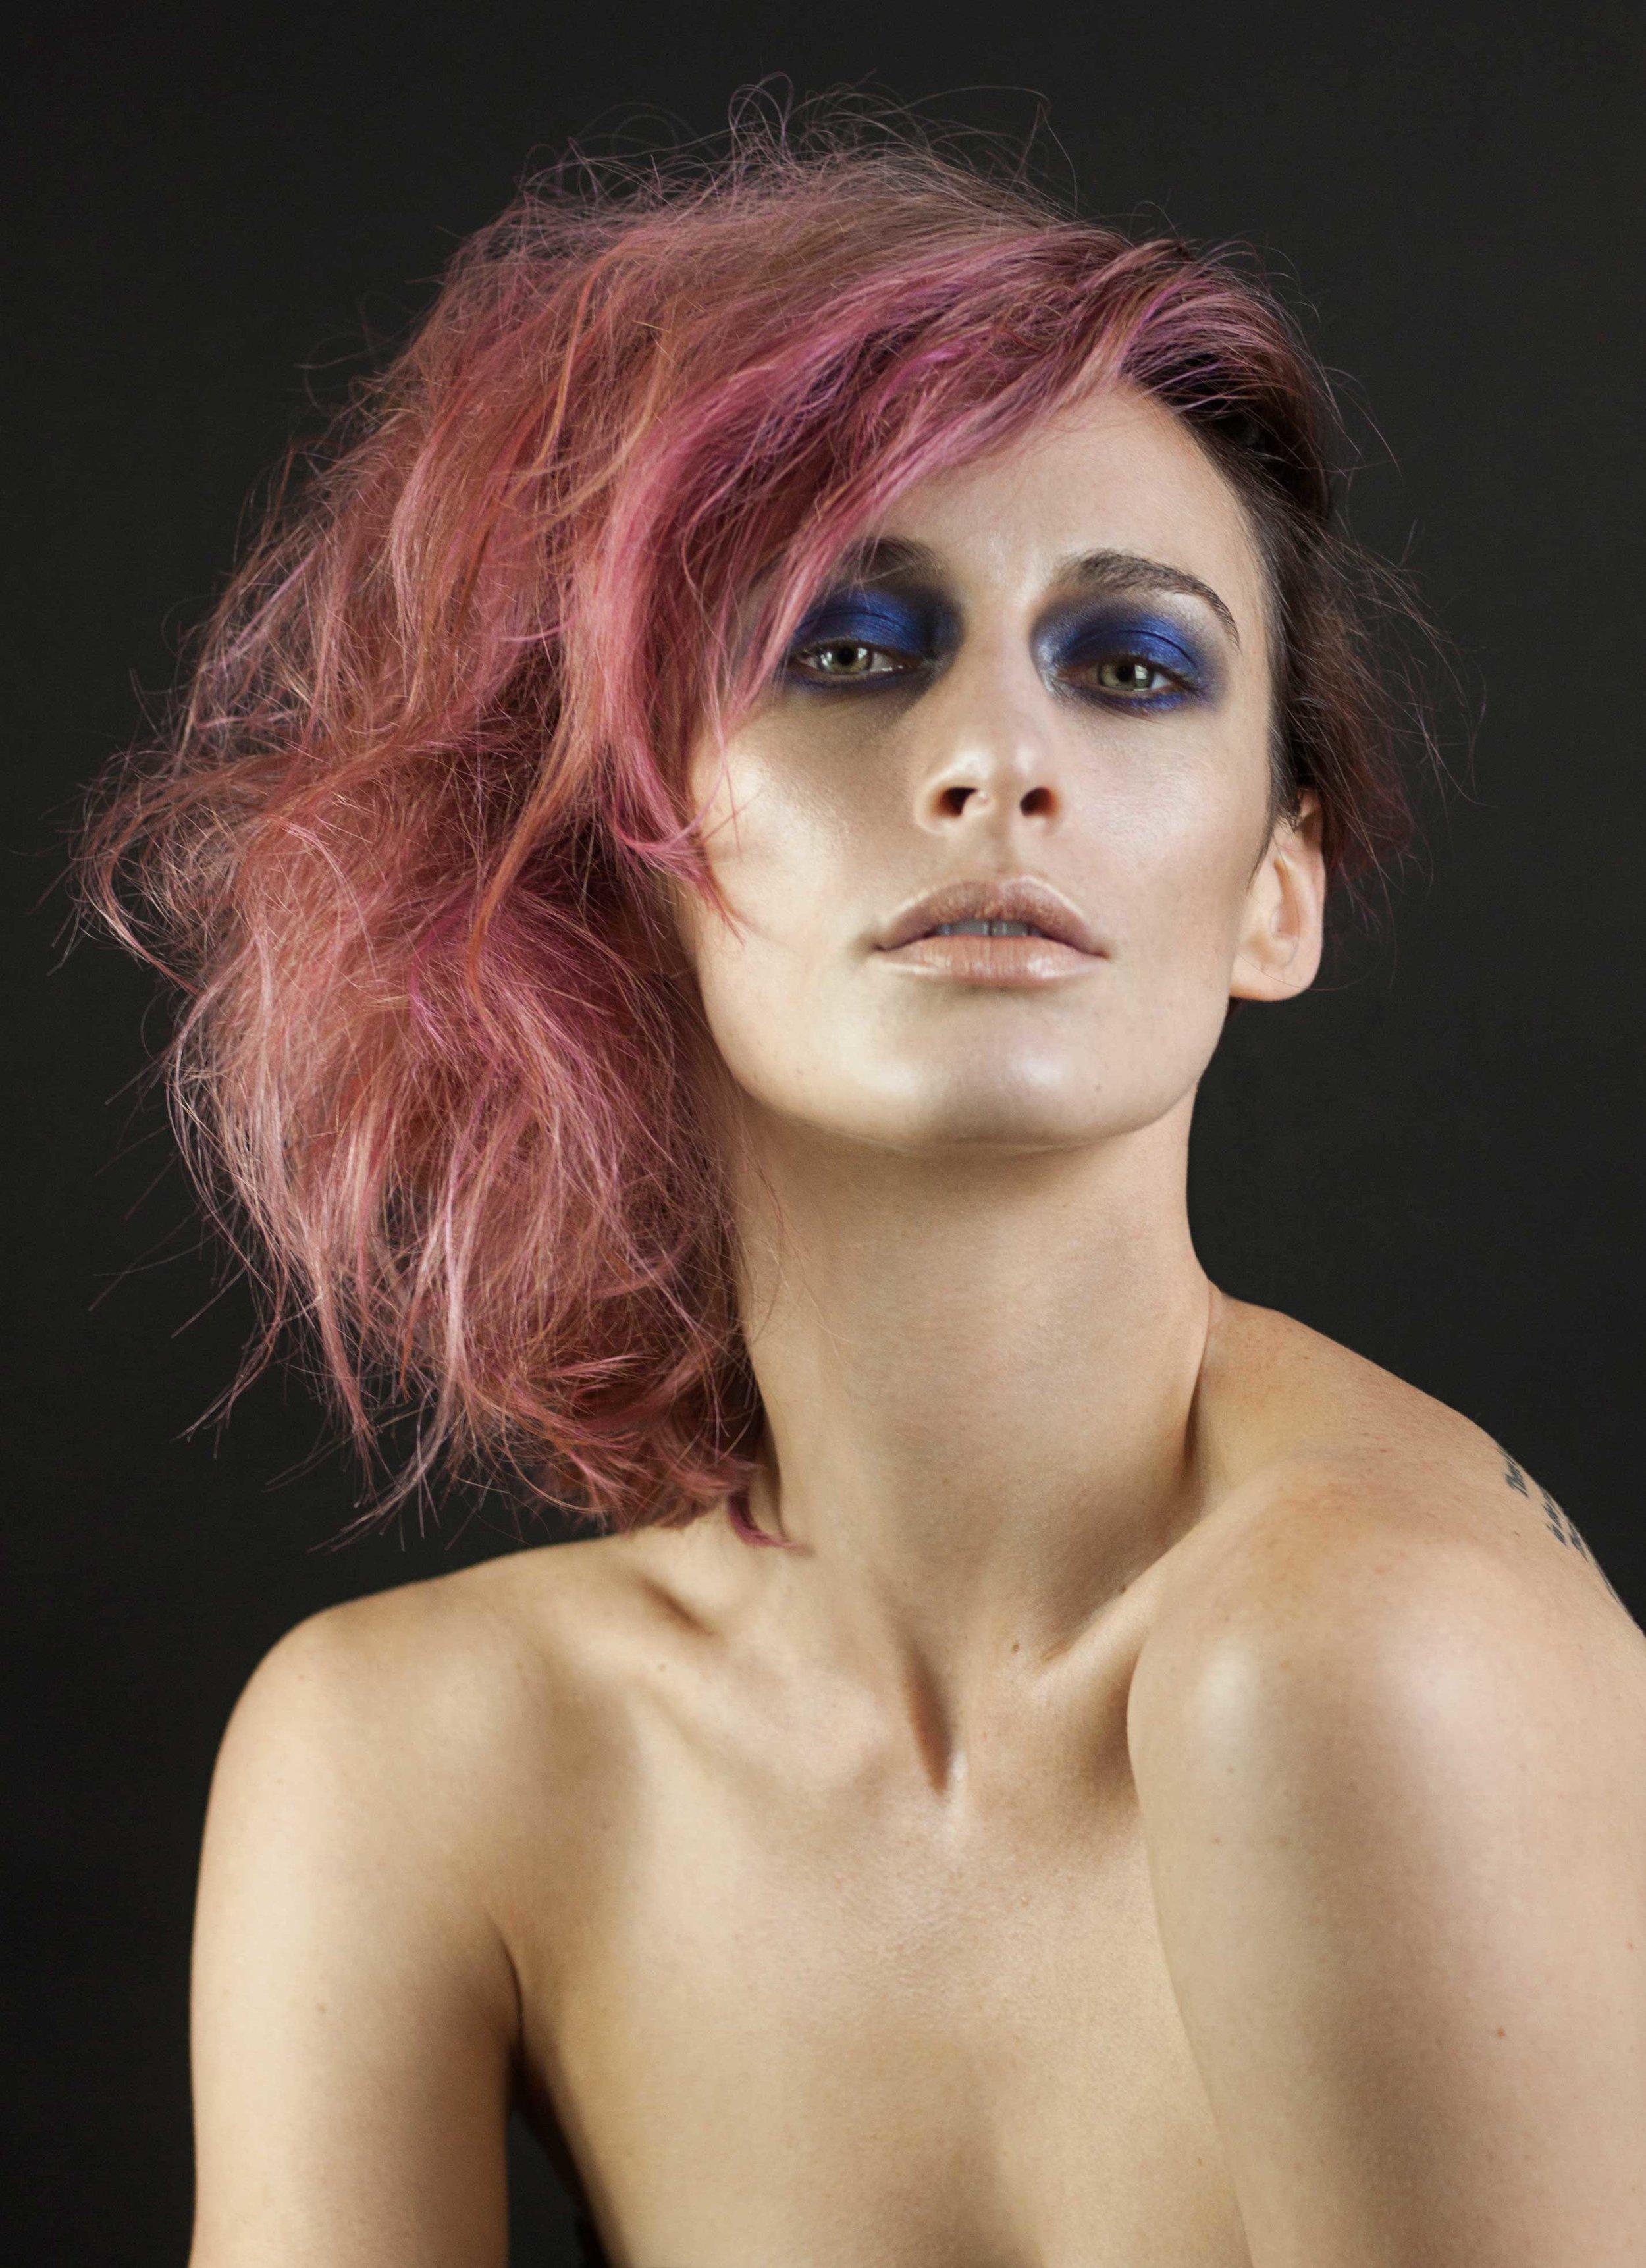 makeupartist-edinburgh_final_croppped_forsite.jpg